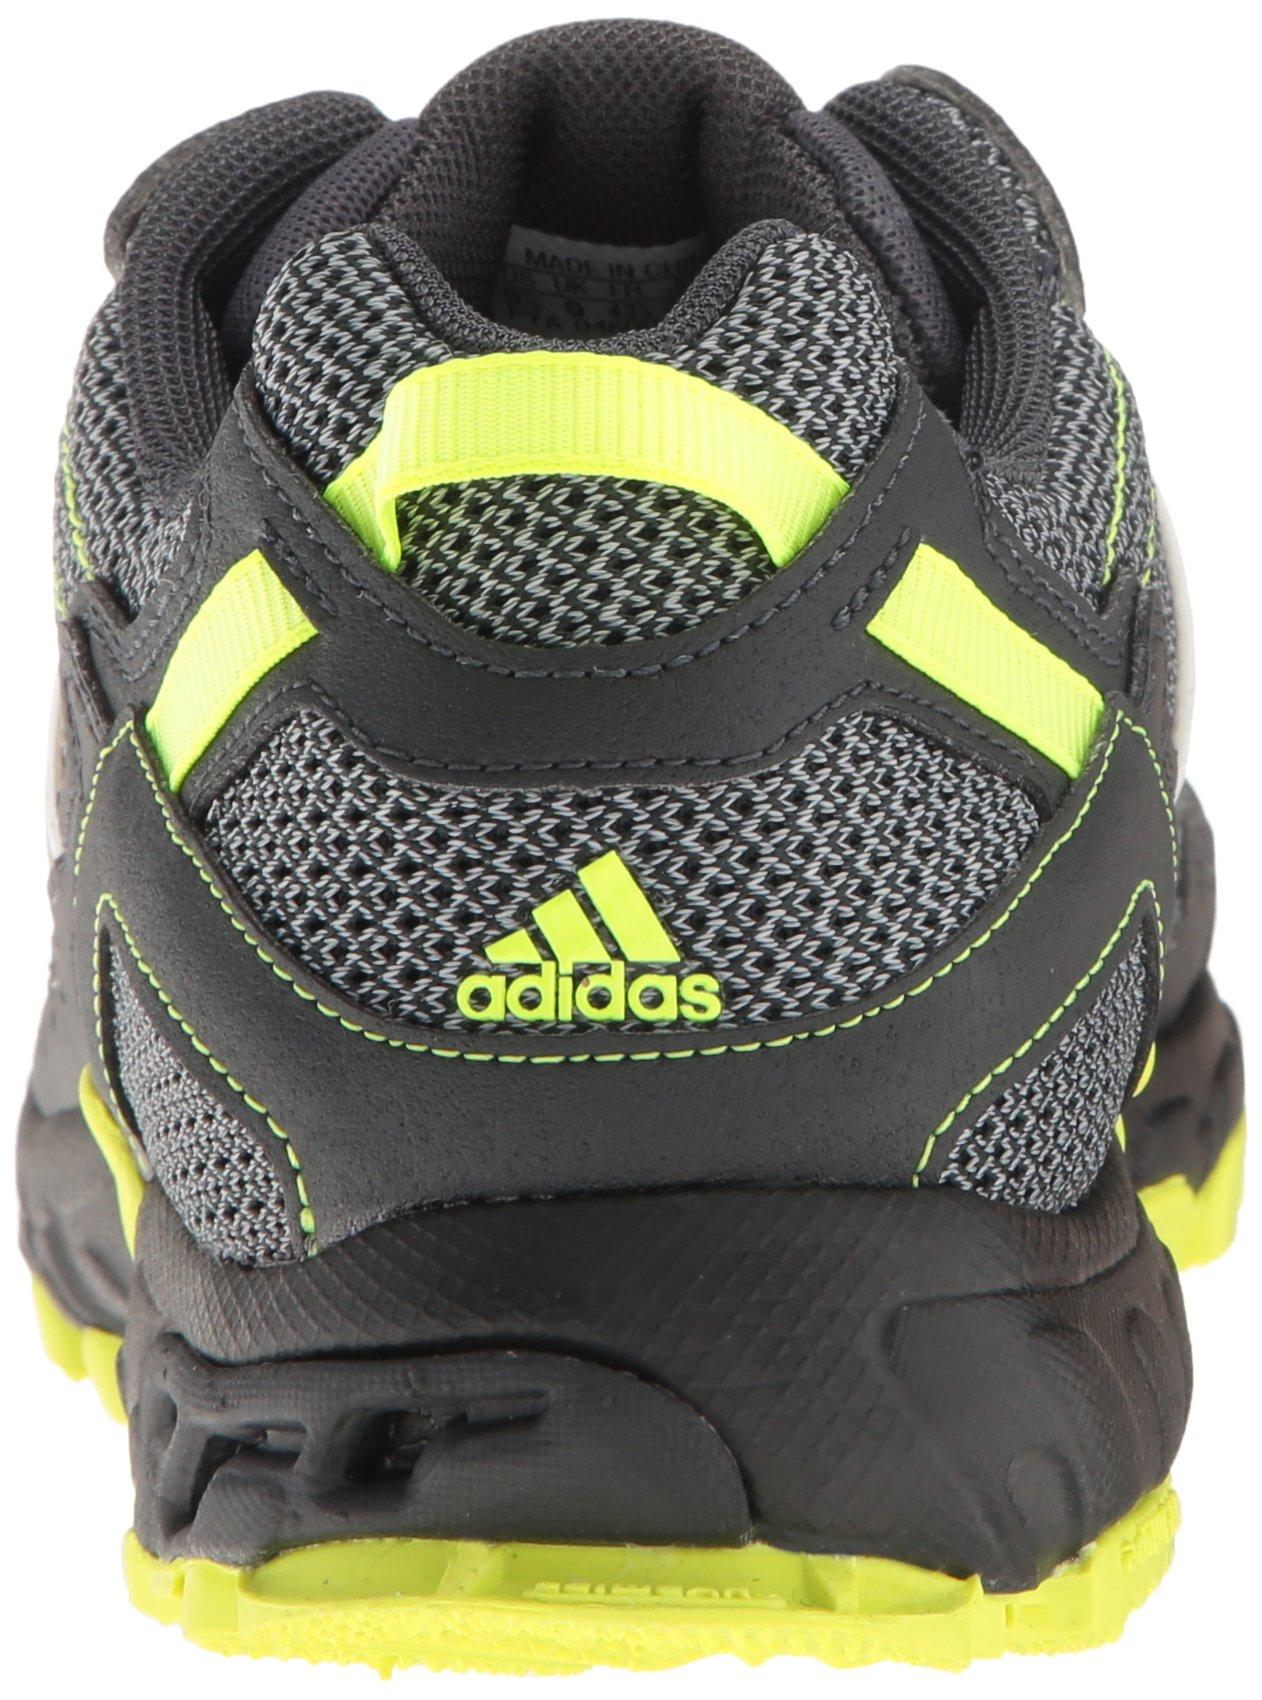 a3a95430e adidas Men s Rockadia M Trail Running Shoe